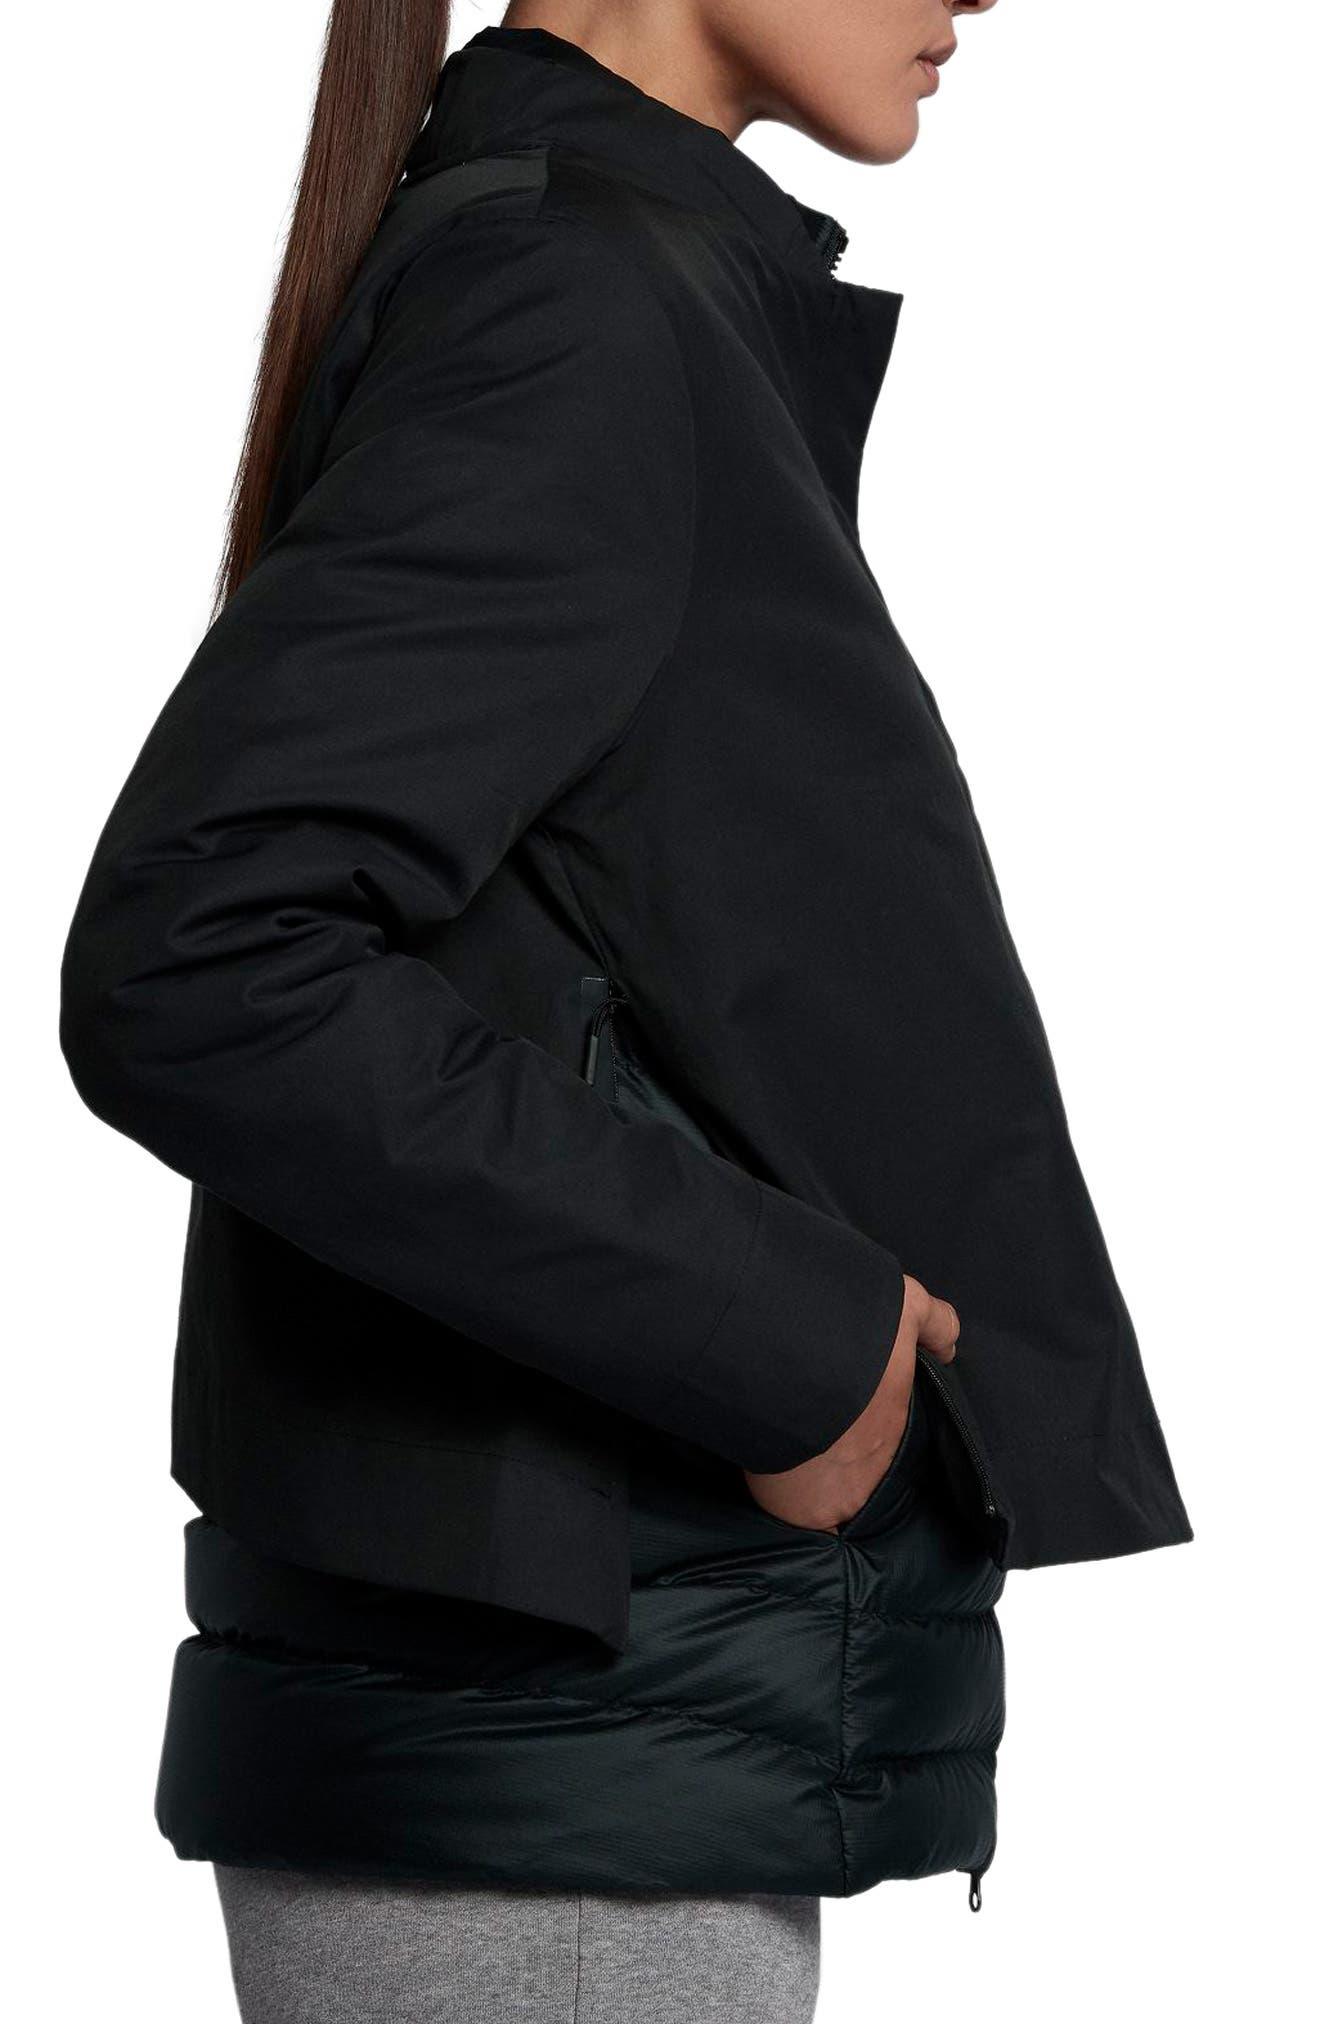 Sportswear AeroLoft 3-in-1 Down Jacket,                             Alternate thumbnail 6, color,                             Black/ Black/ Black